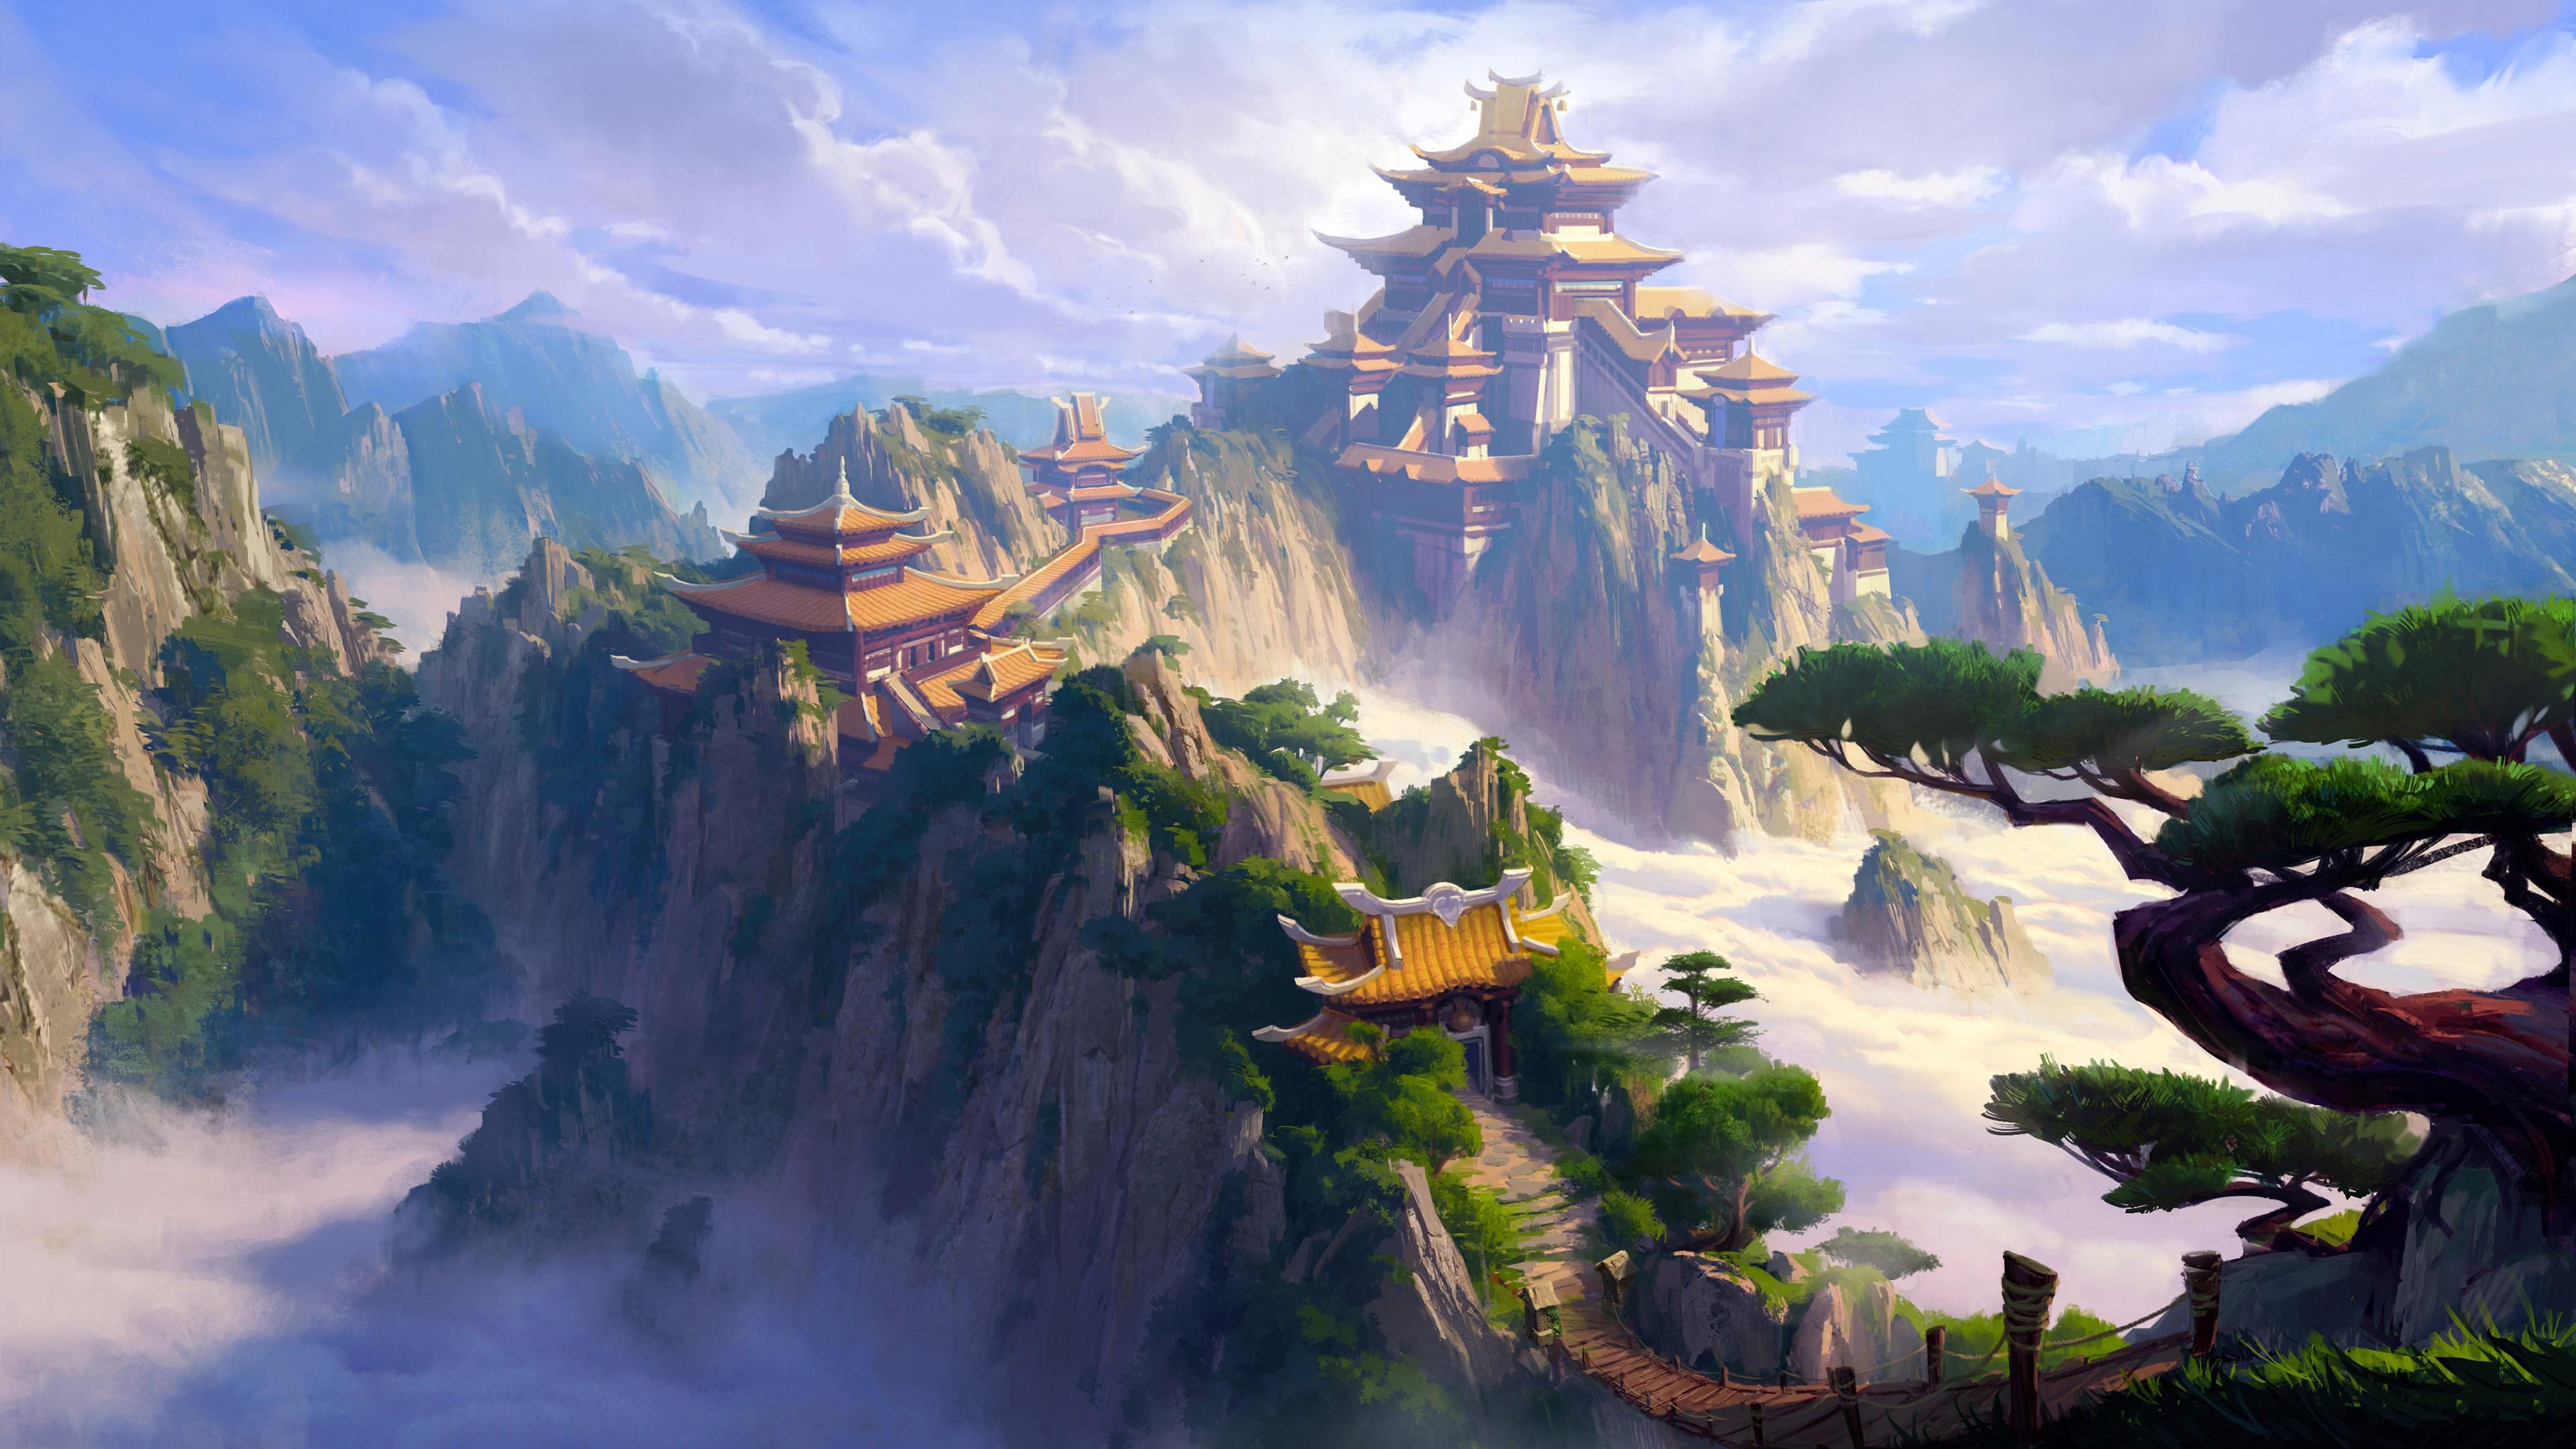 Fantasy Landscape Wallpaper 4k 3840x2160 Wallpaper Teahub Io